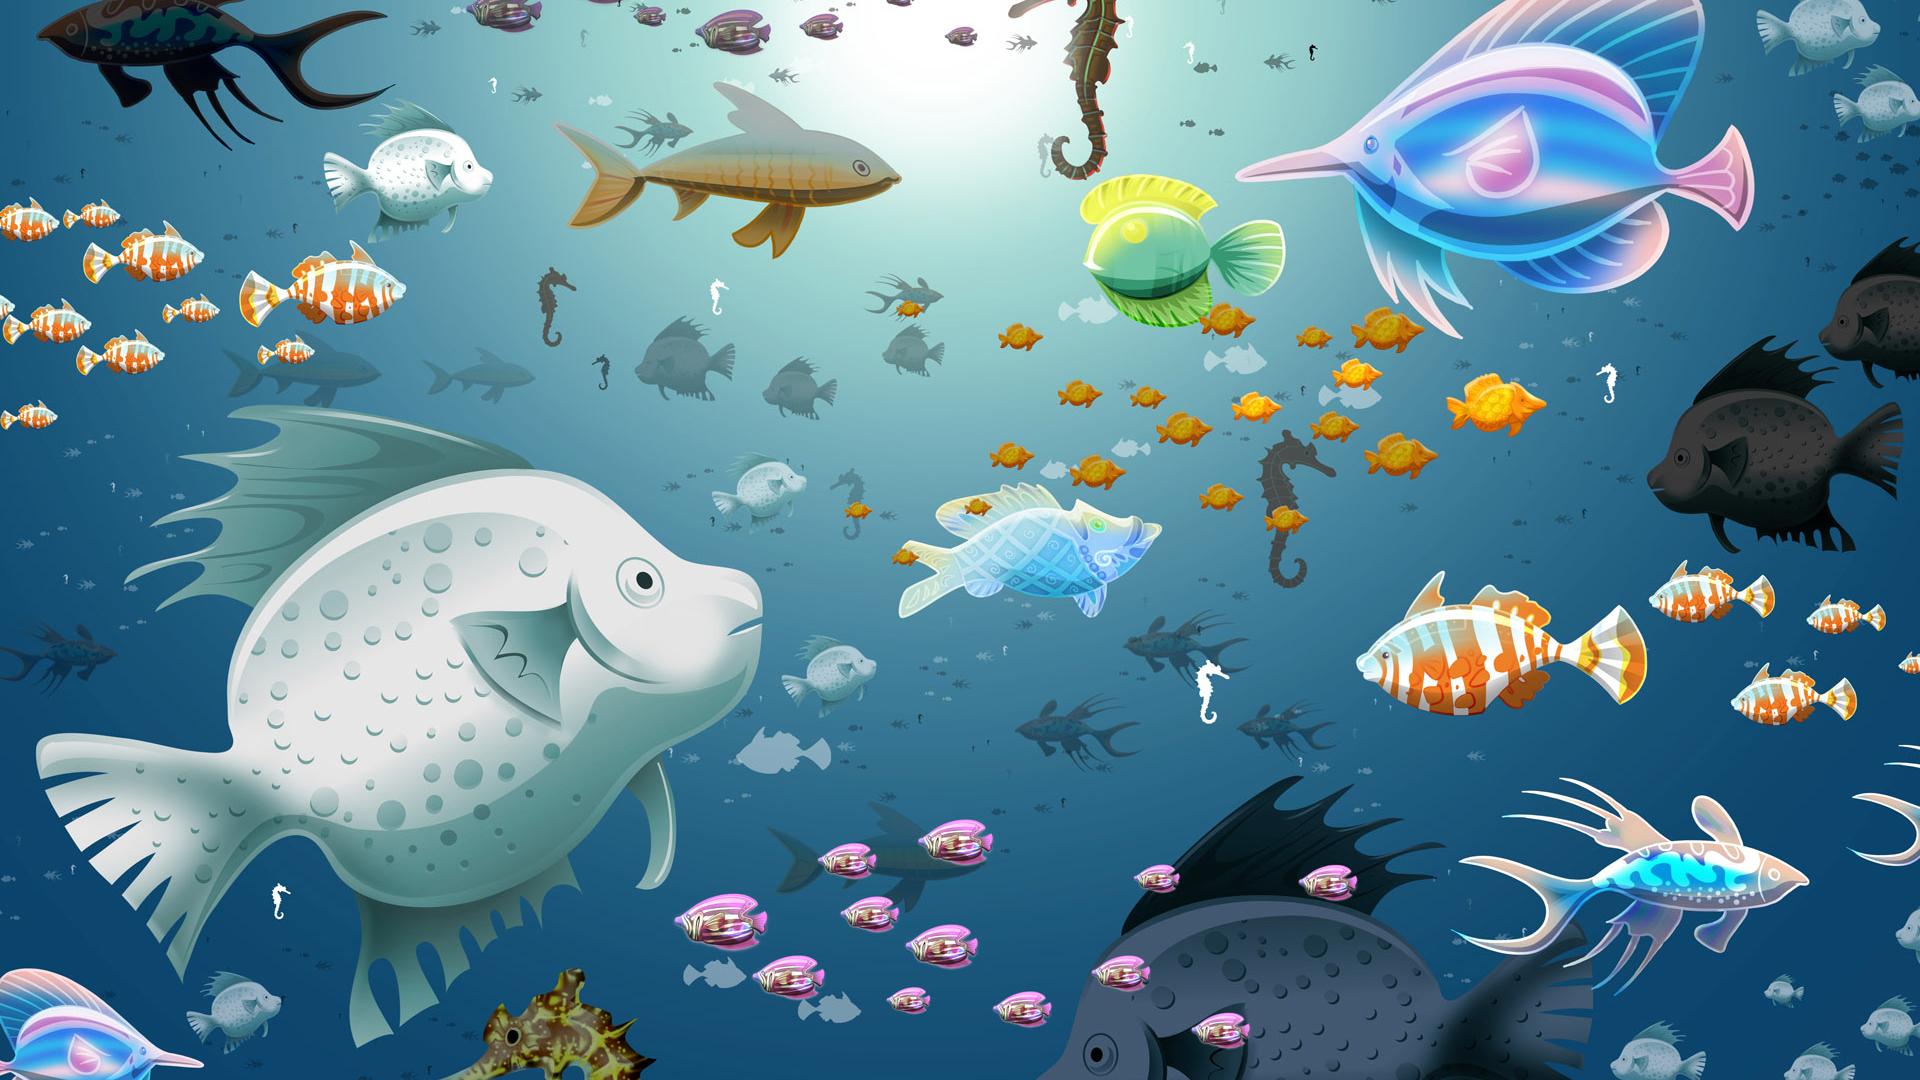 Free Download Canada Fish Tank Diy Easy Fish Tank Background Trash Bags 1920x1200 For Your Desktop Mobile Tablet Explore 50 Free 3d Fish Tank Wallpaper Fish Tank Wallpaper Animated